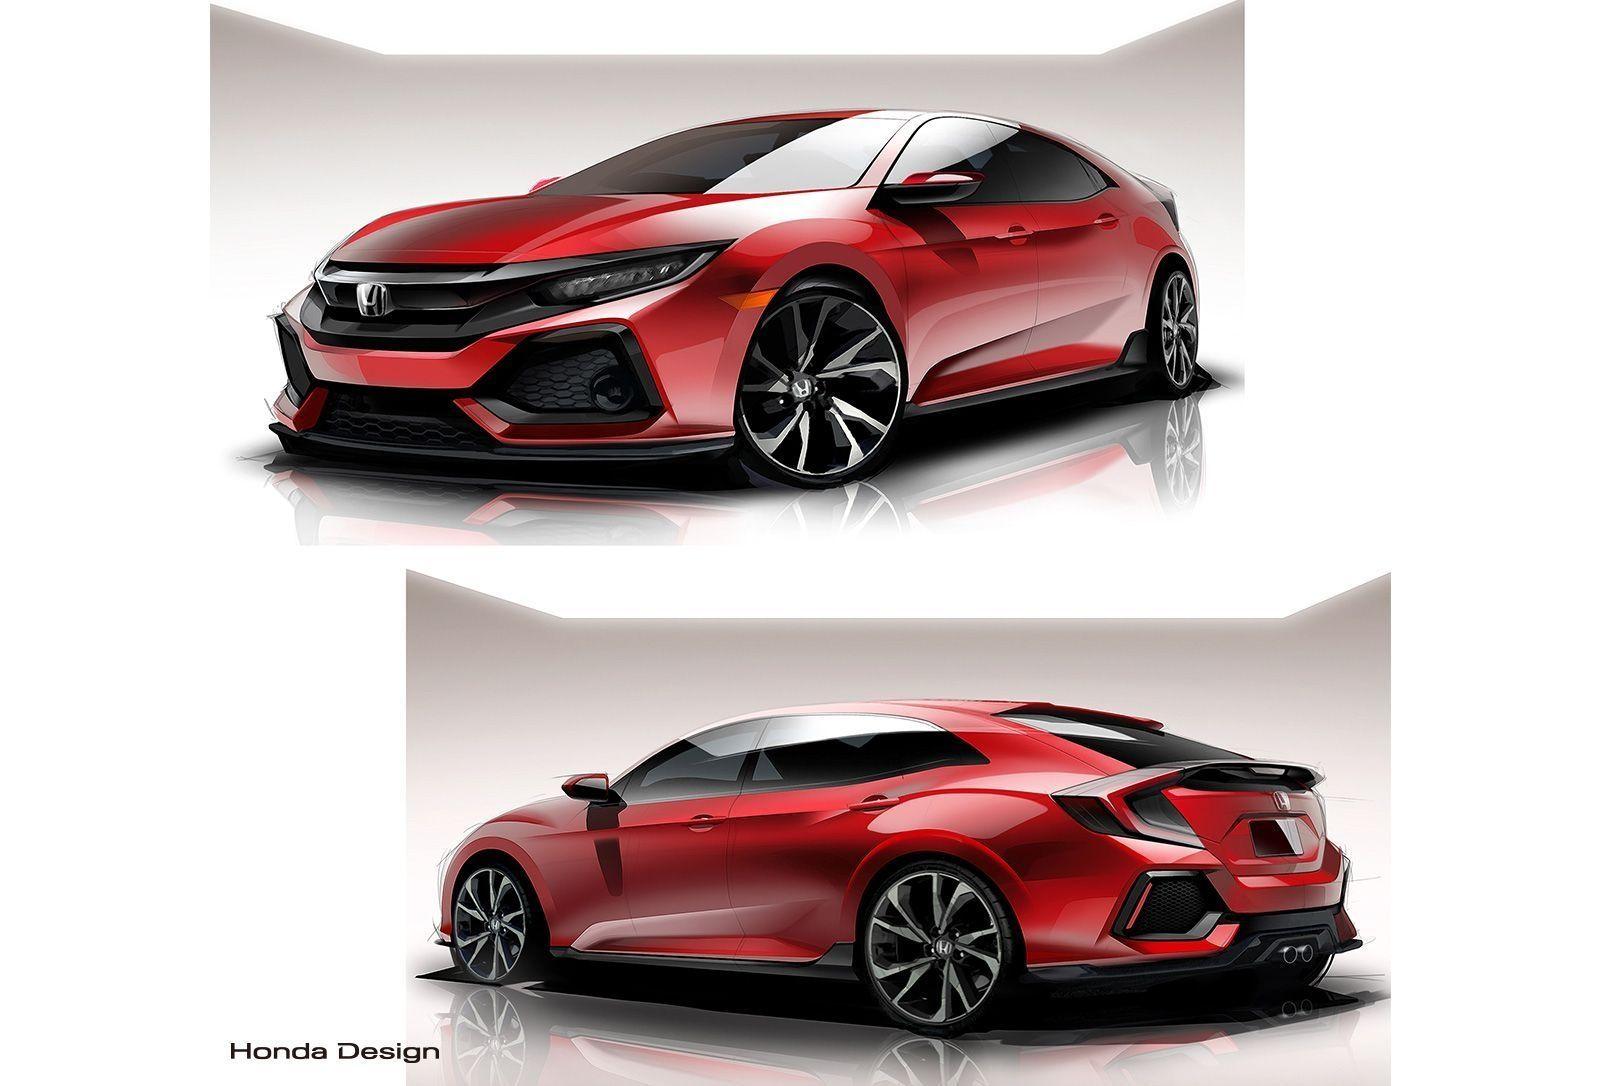 2021 Honda Civic Hybrid Release Date